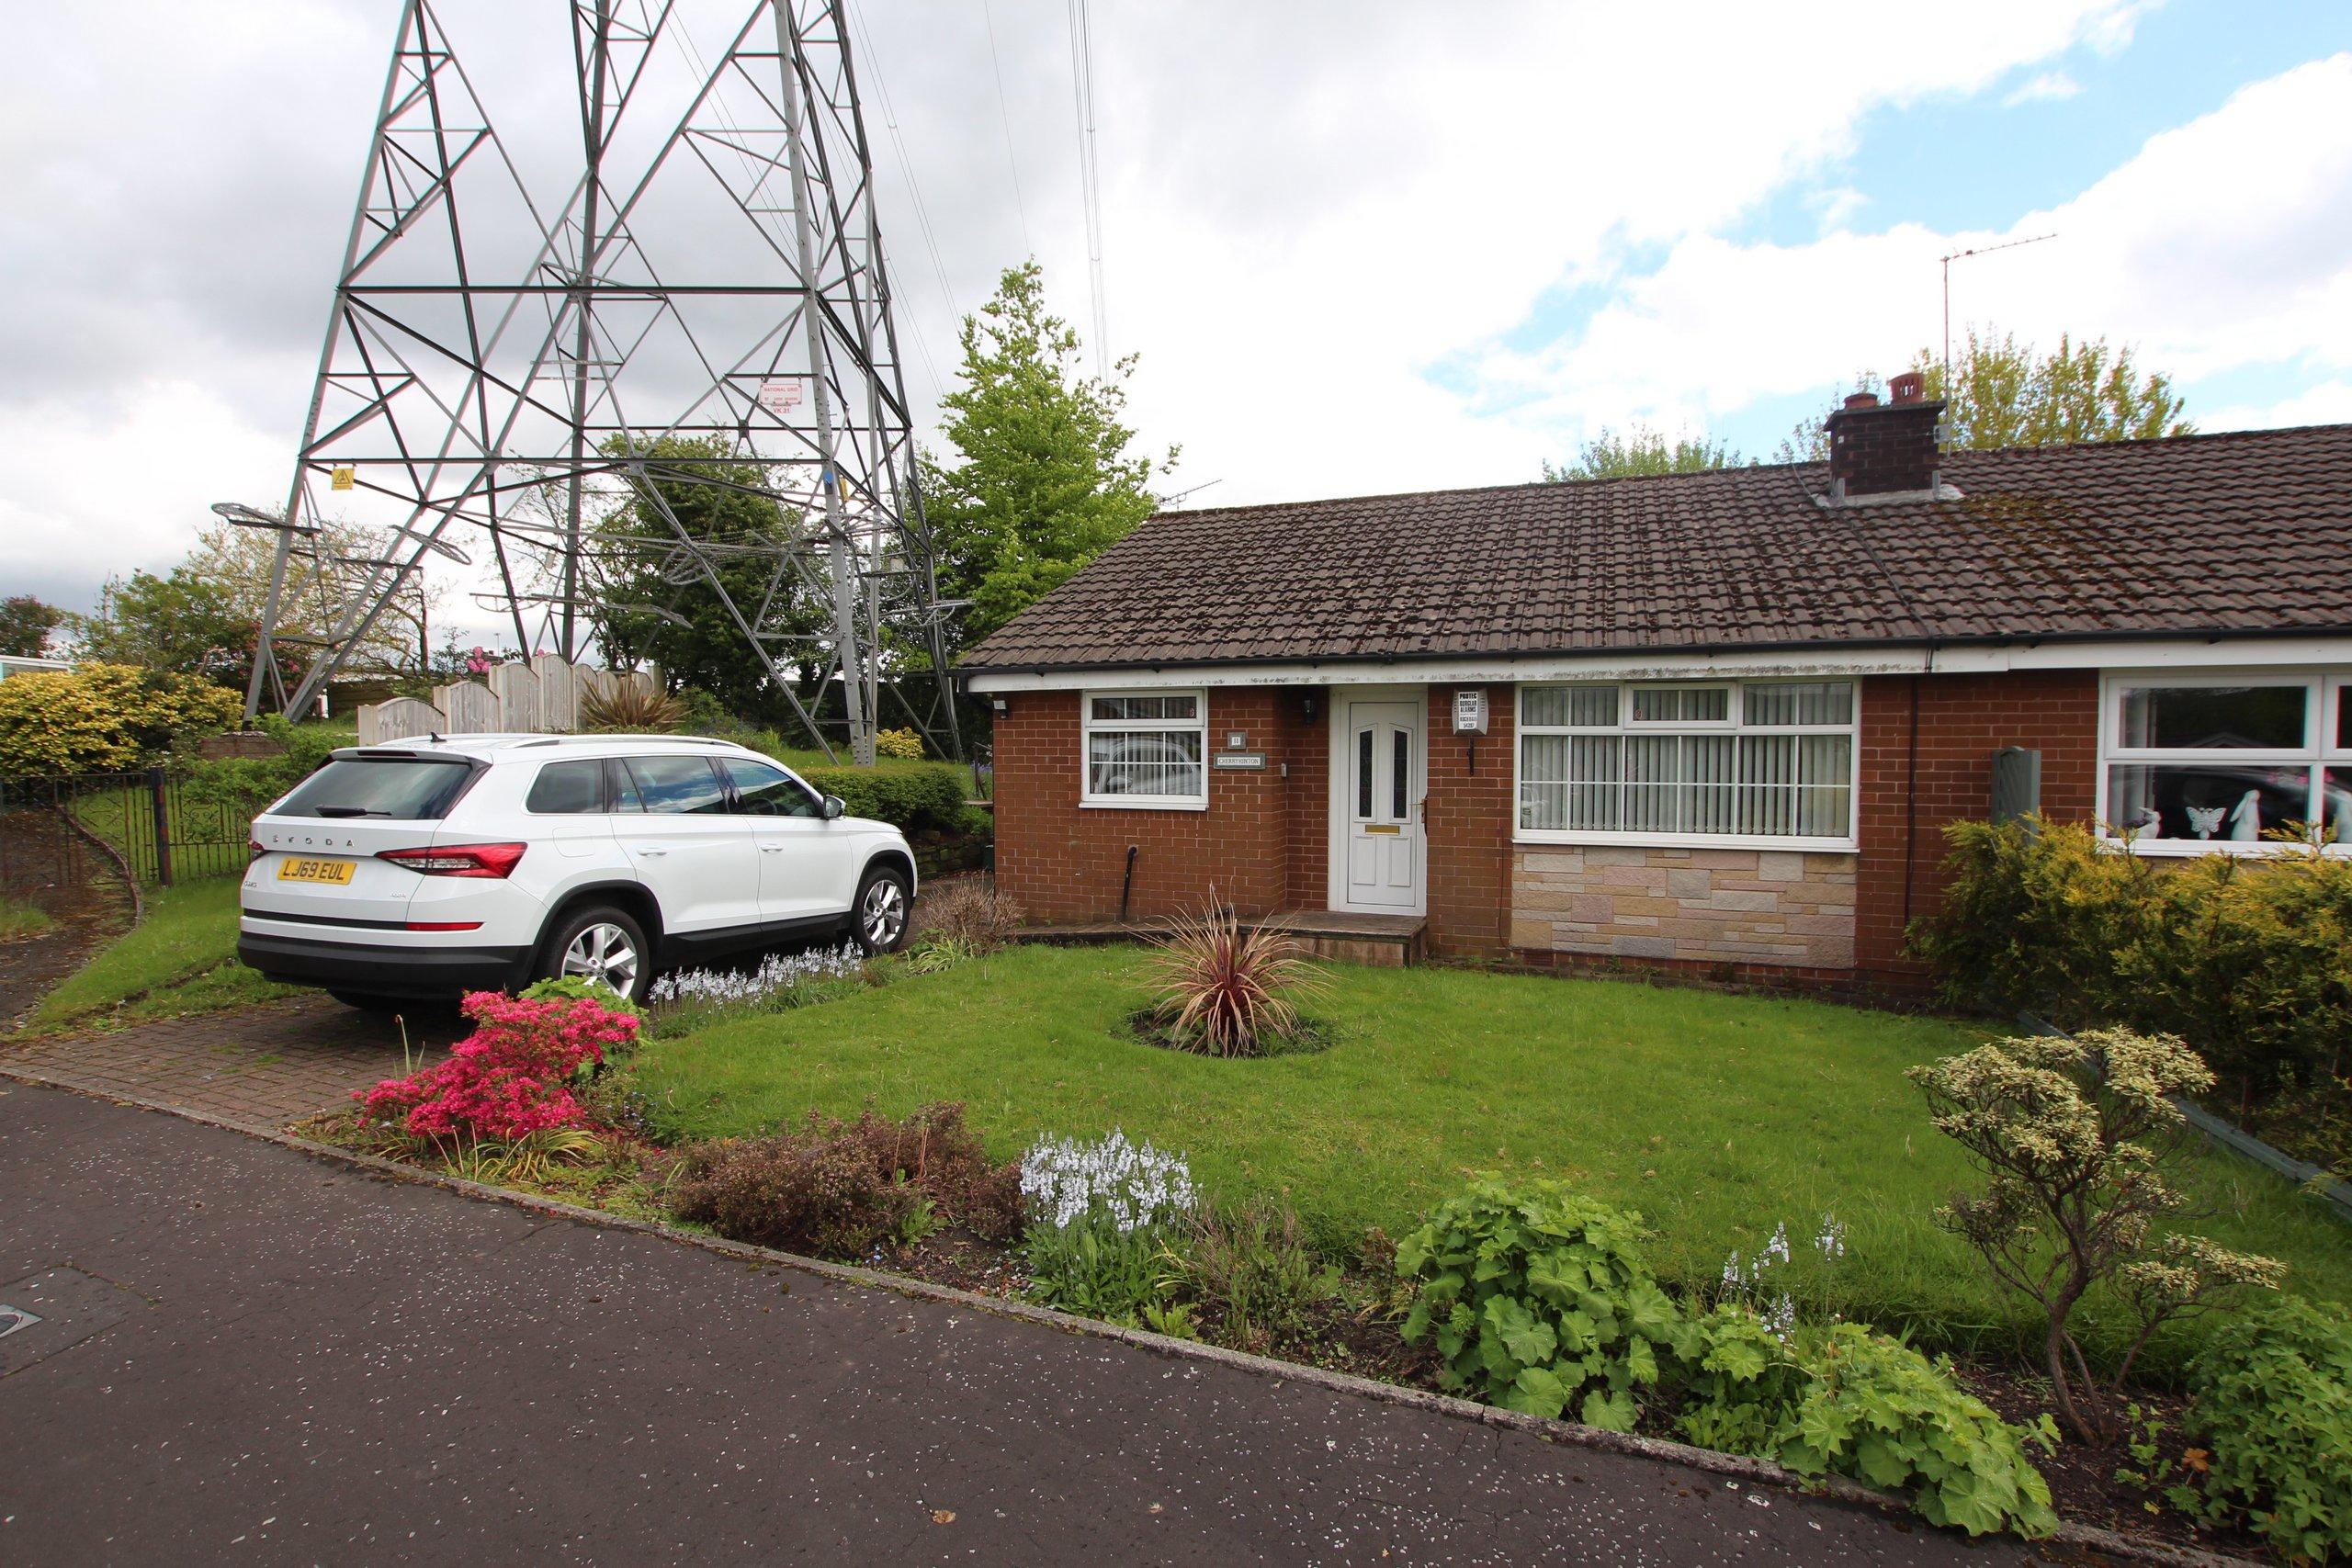 Hinton Close, Bamford, Rochdale OL11 5HT